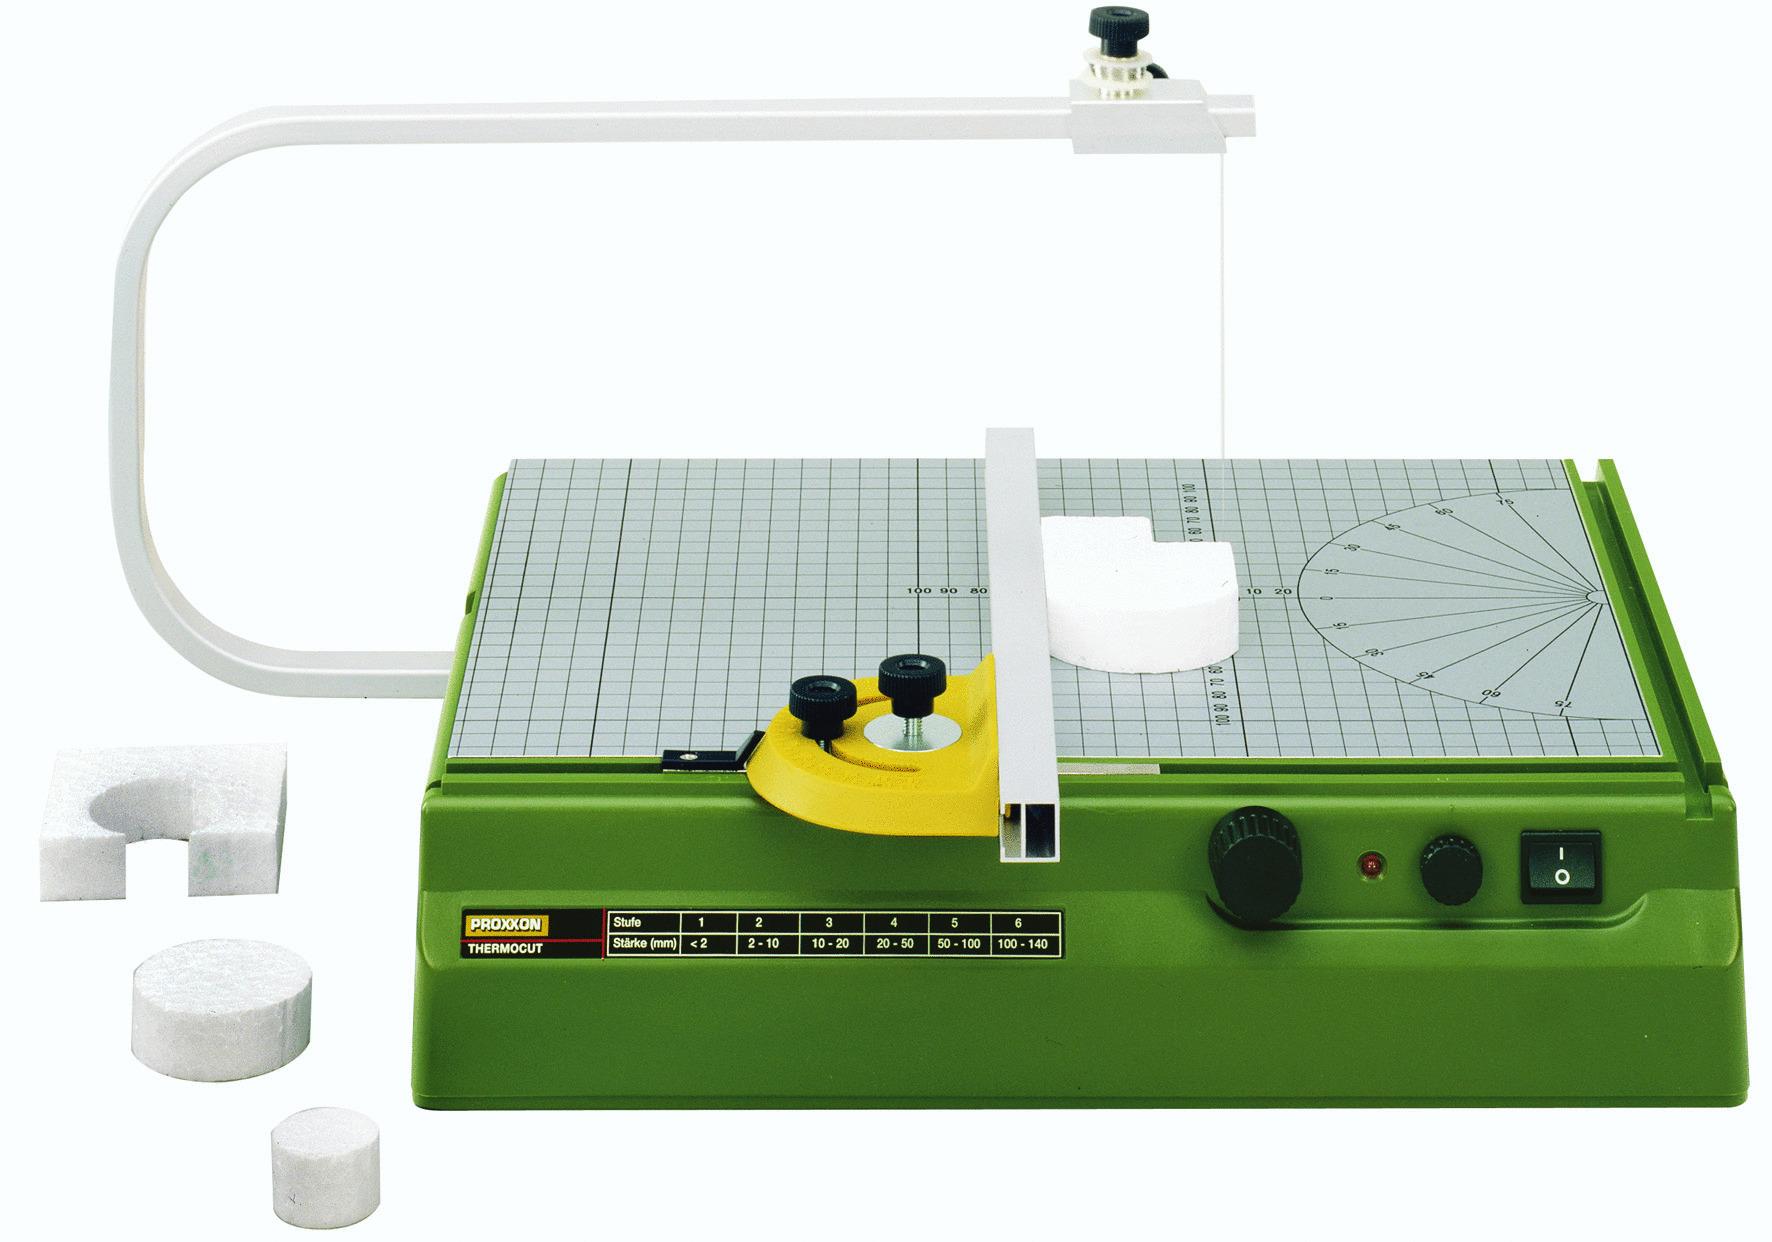 proxon termocut 27080-1